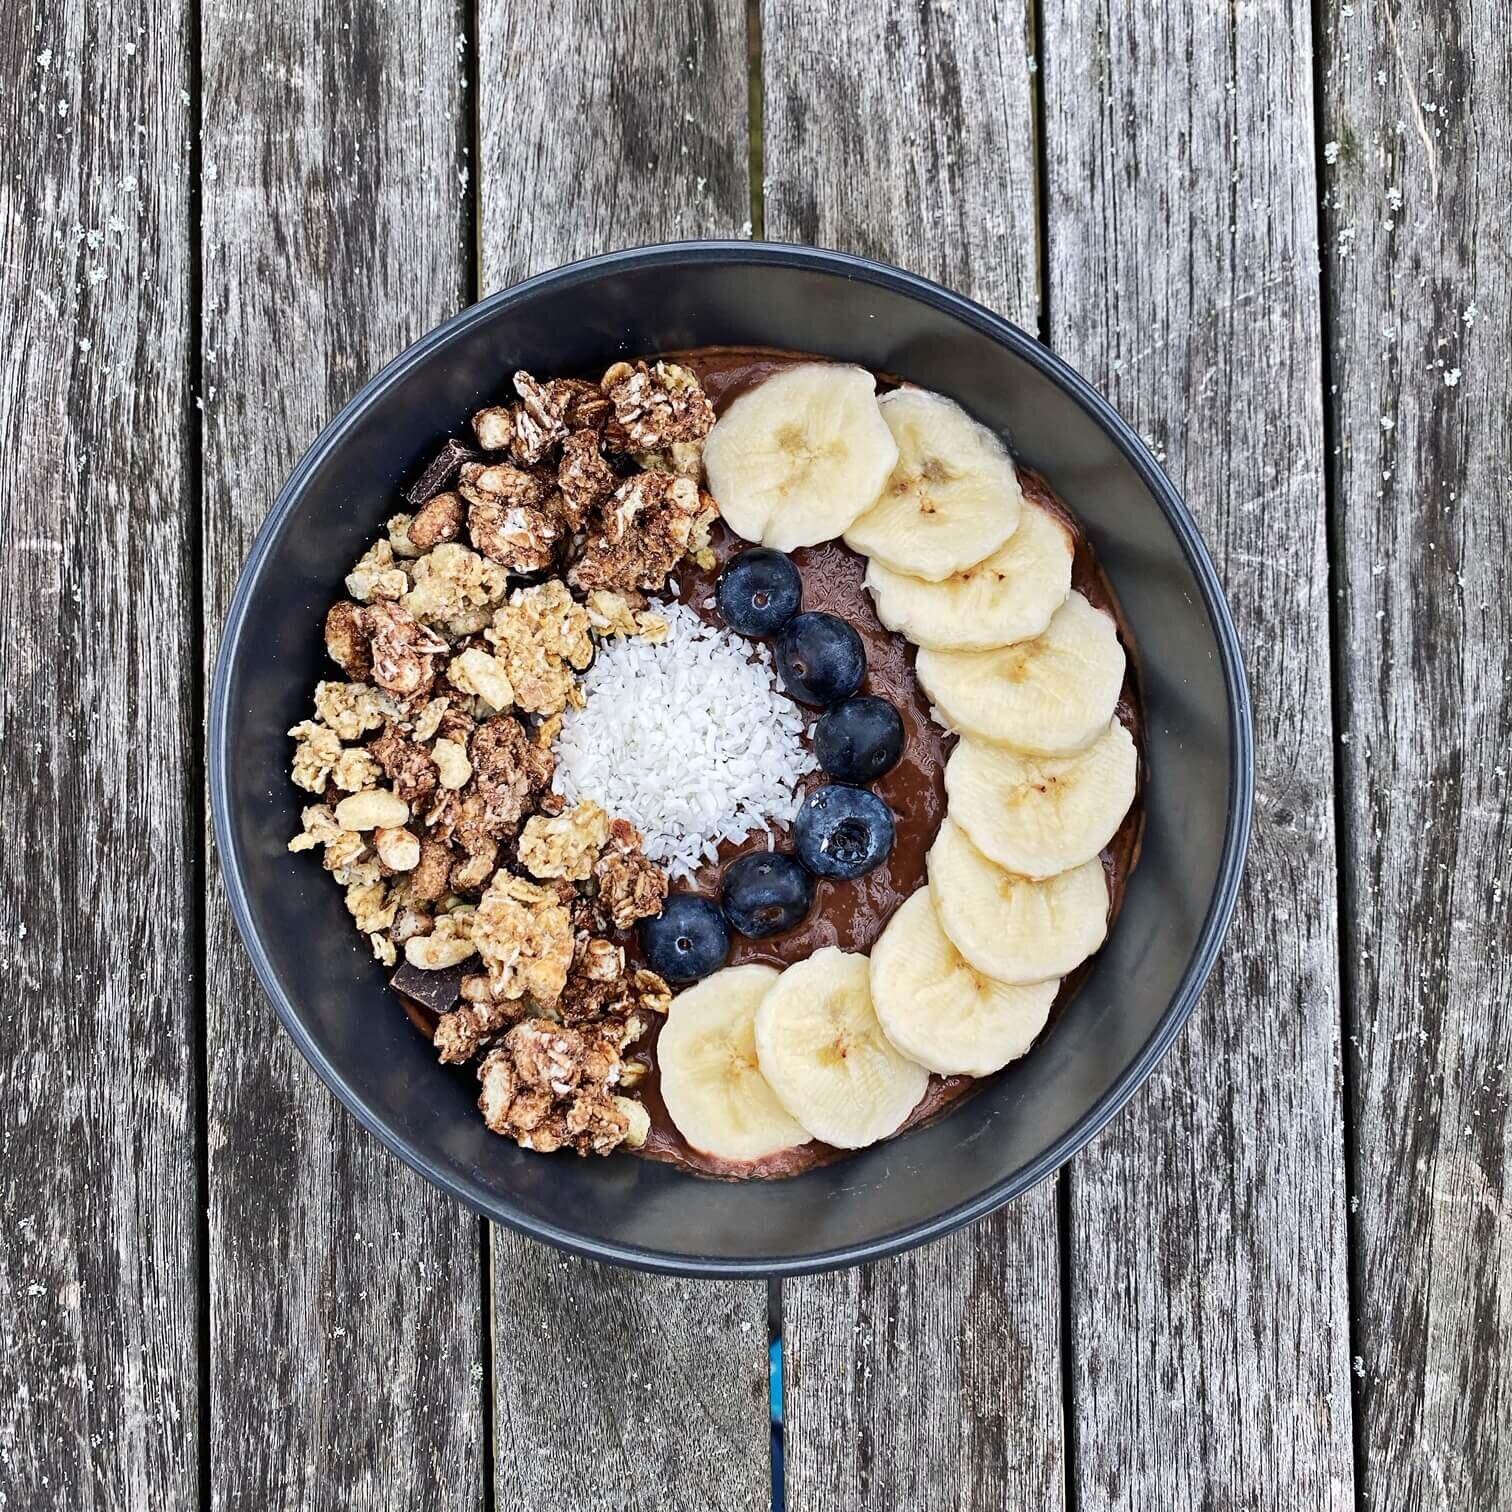 Healthy Vegan Chocolate and Banana Smoothie Bowl